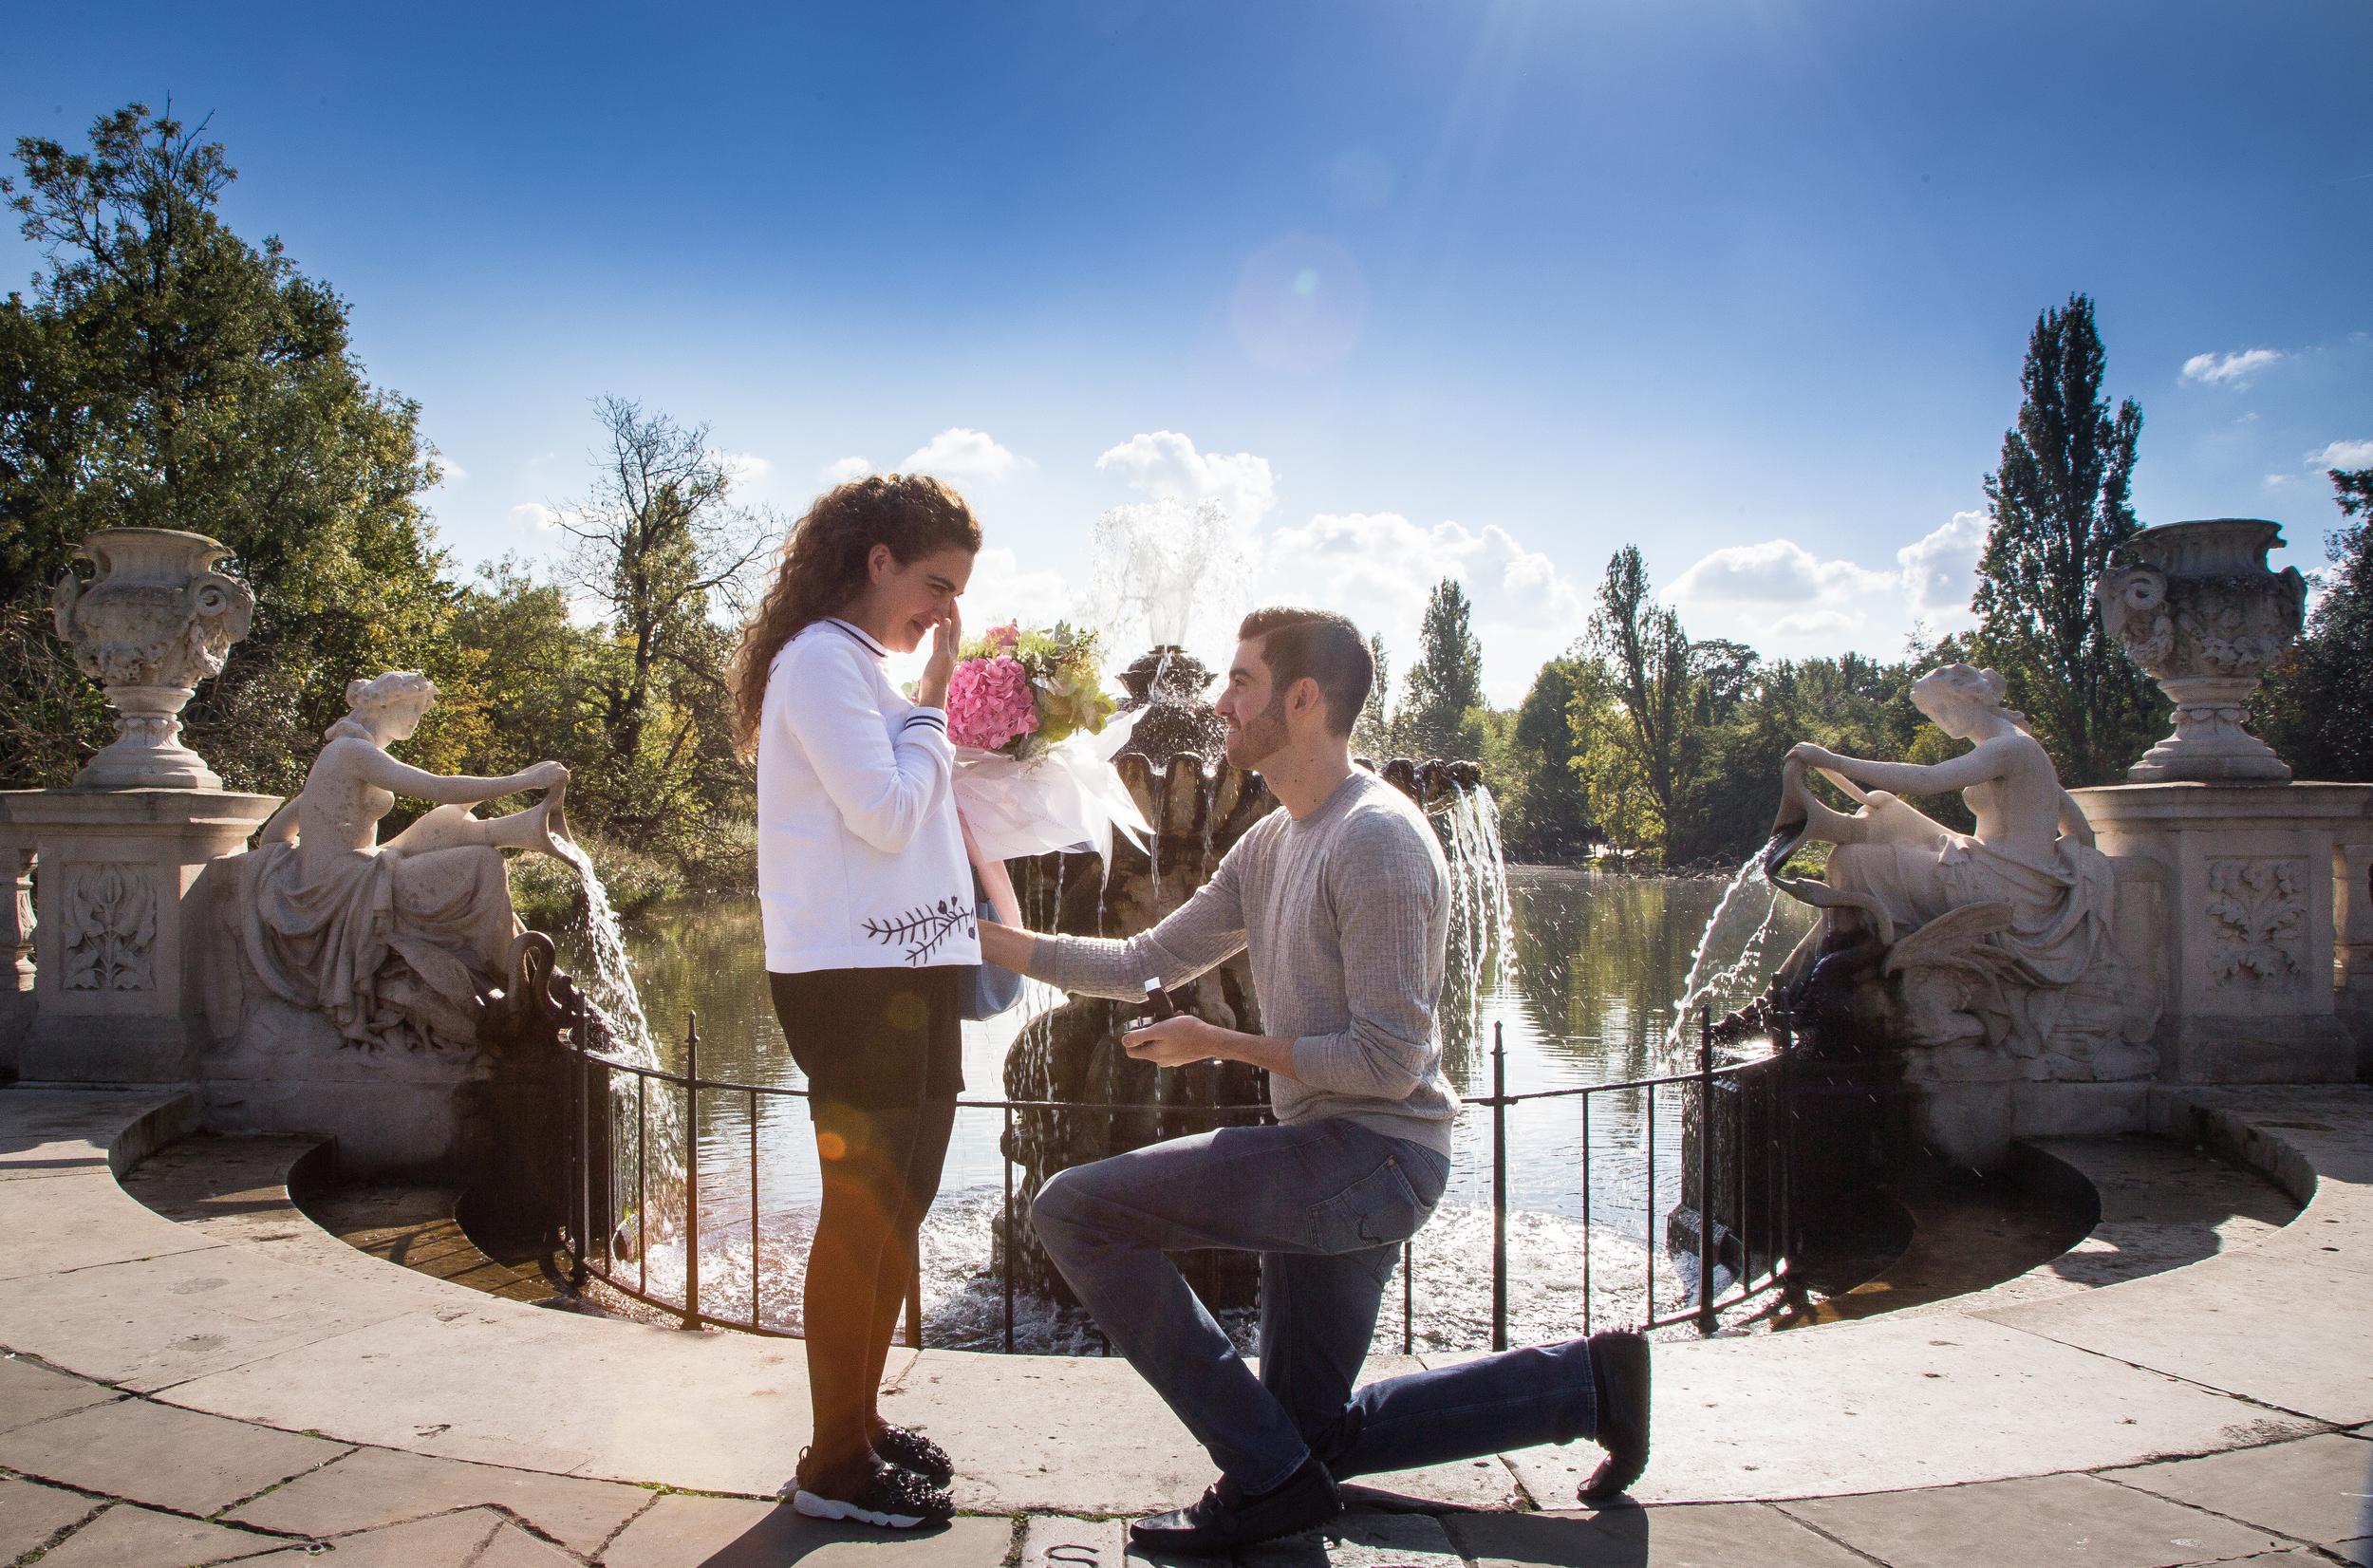 hyde park proposal engagement photography london 15